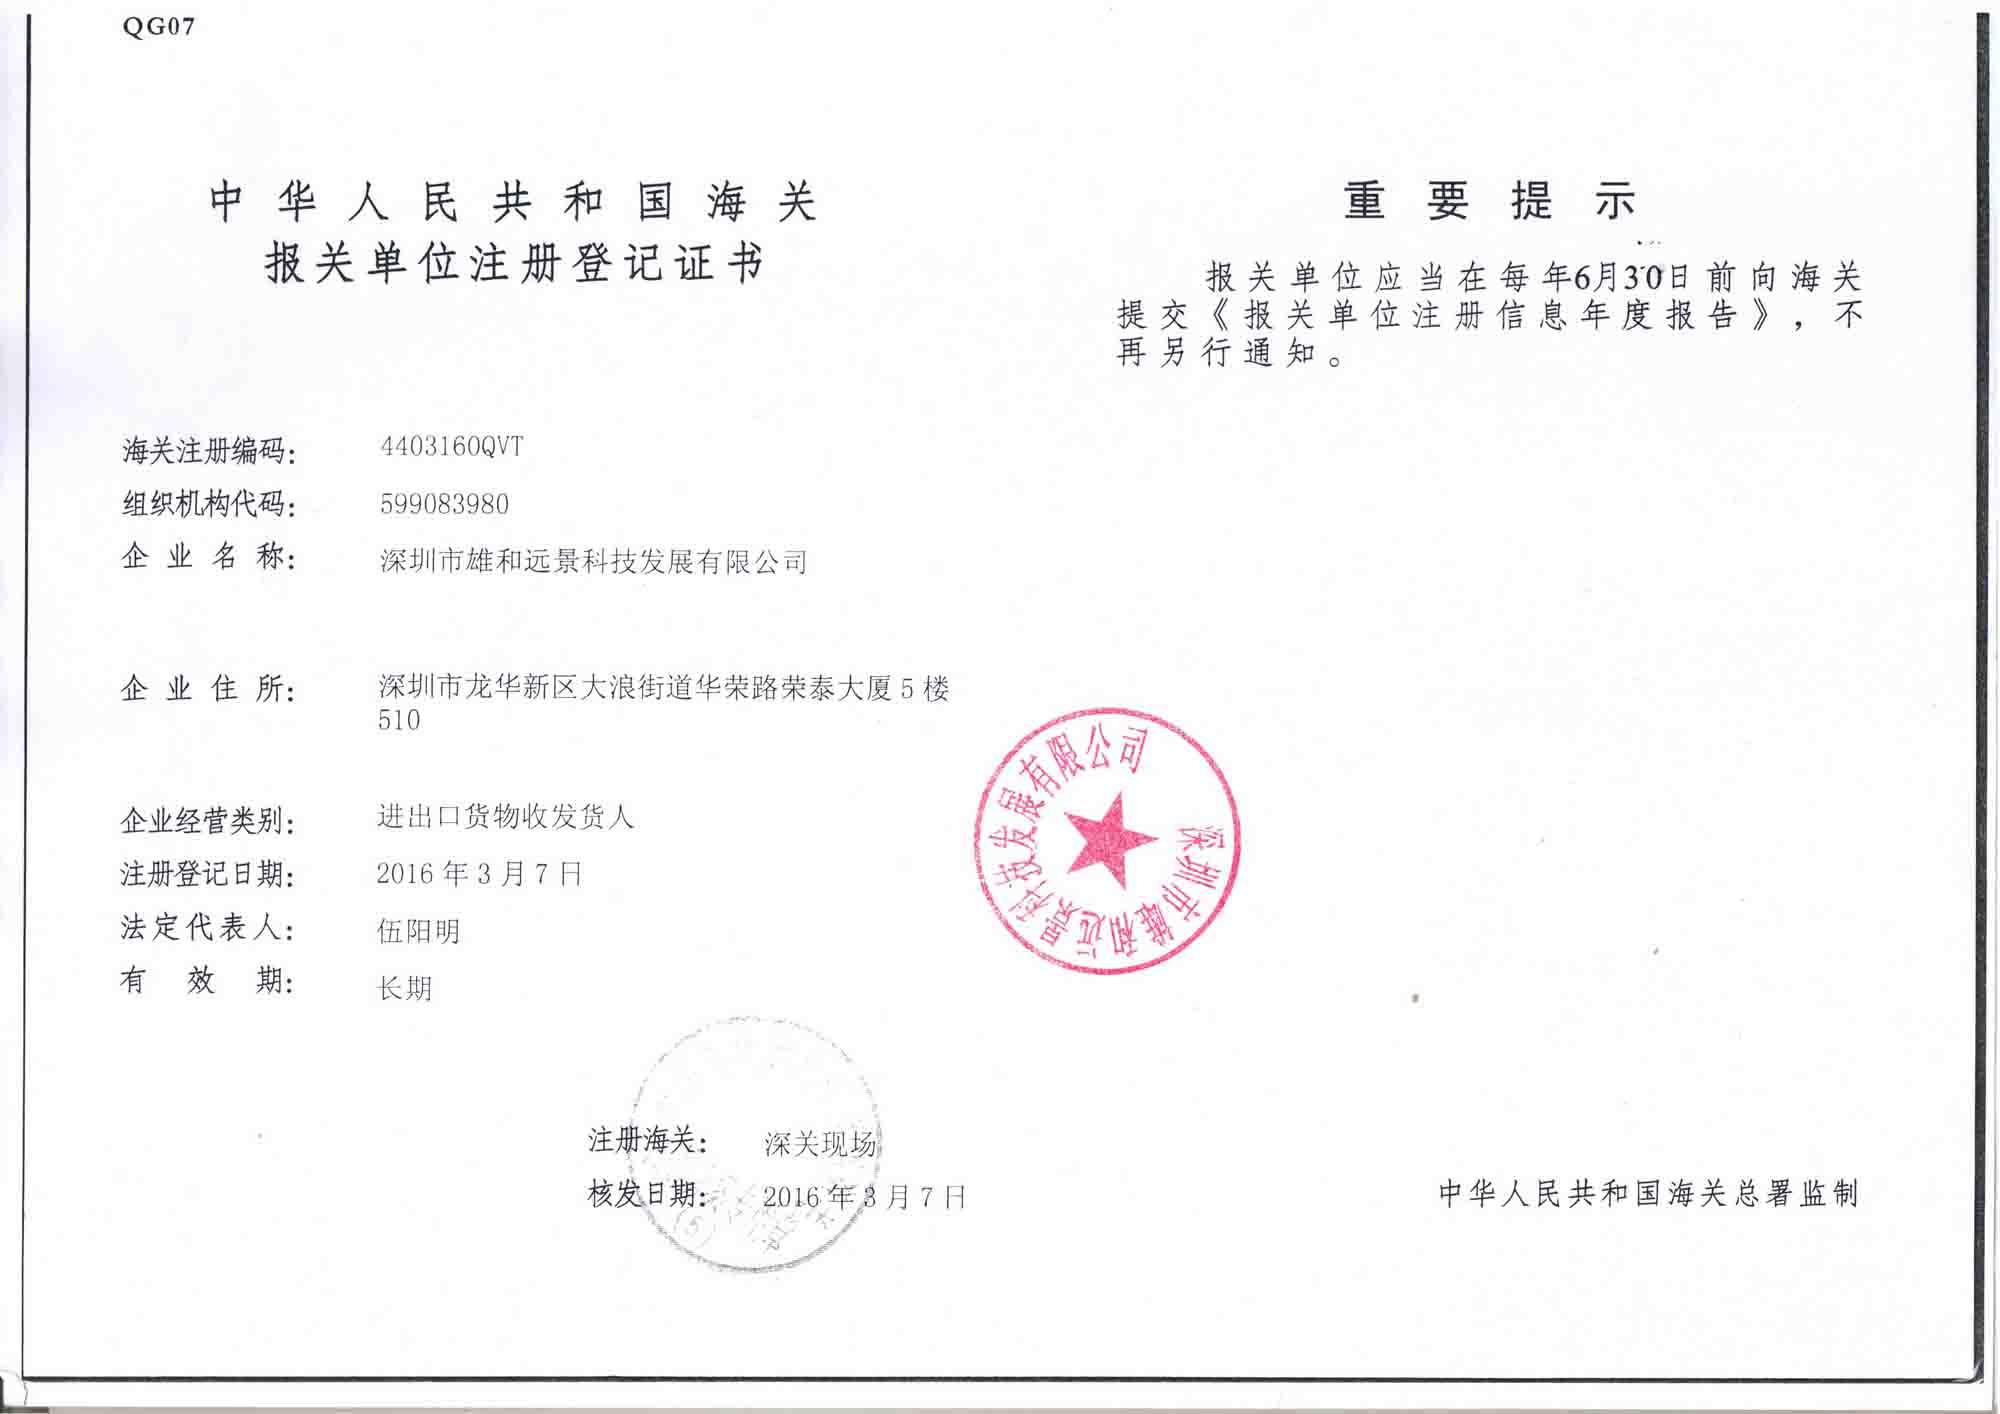 Registration certificate of customs declaration unit